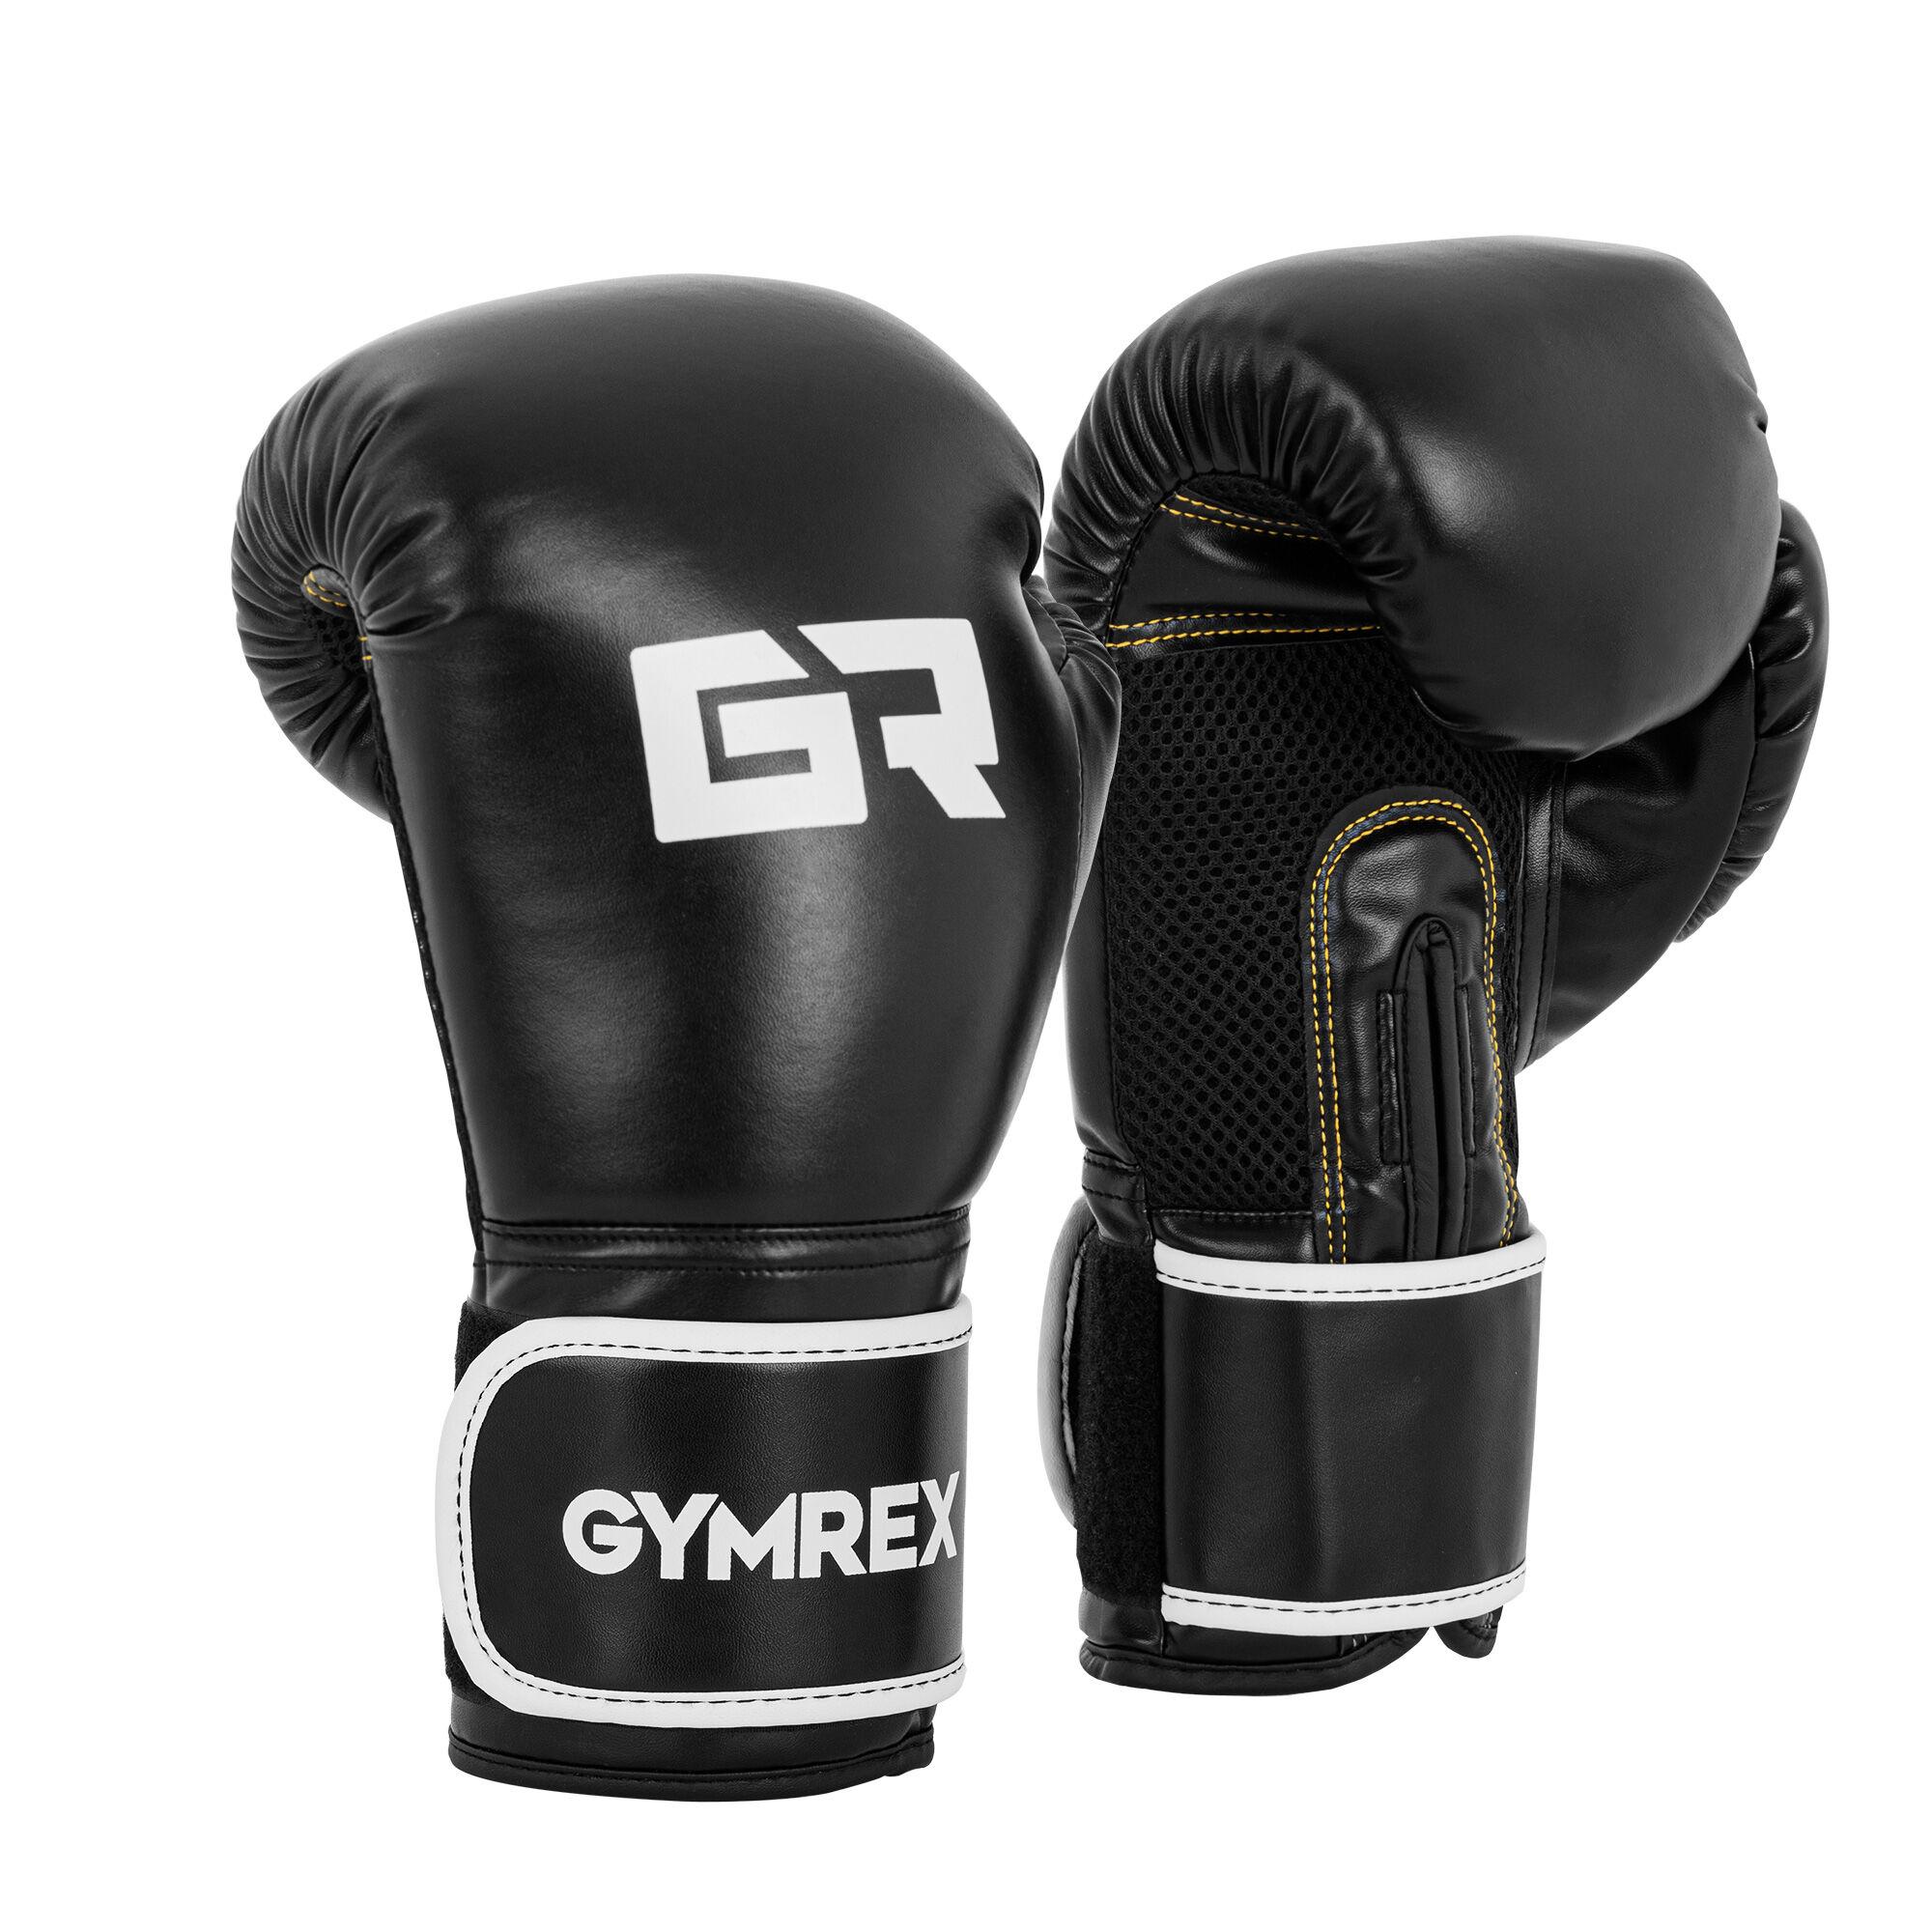 Gymrex Gants de boxe - 14 oz - Paume Mesh - Noirs GR-BG 14B